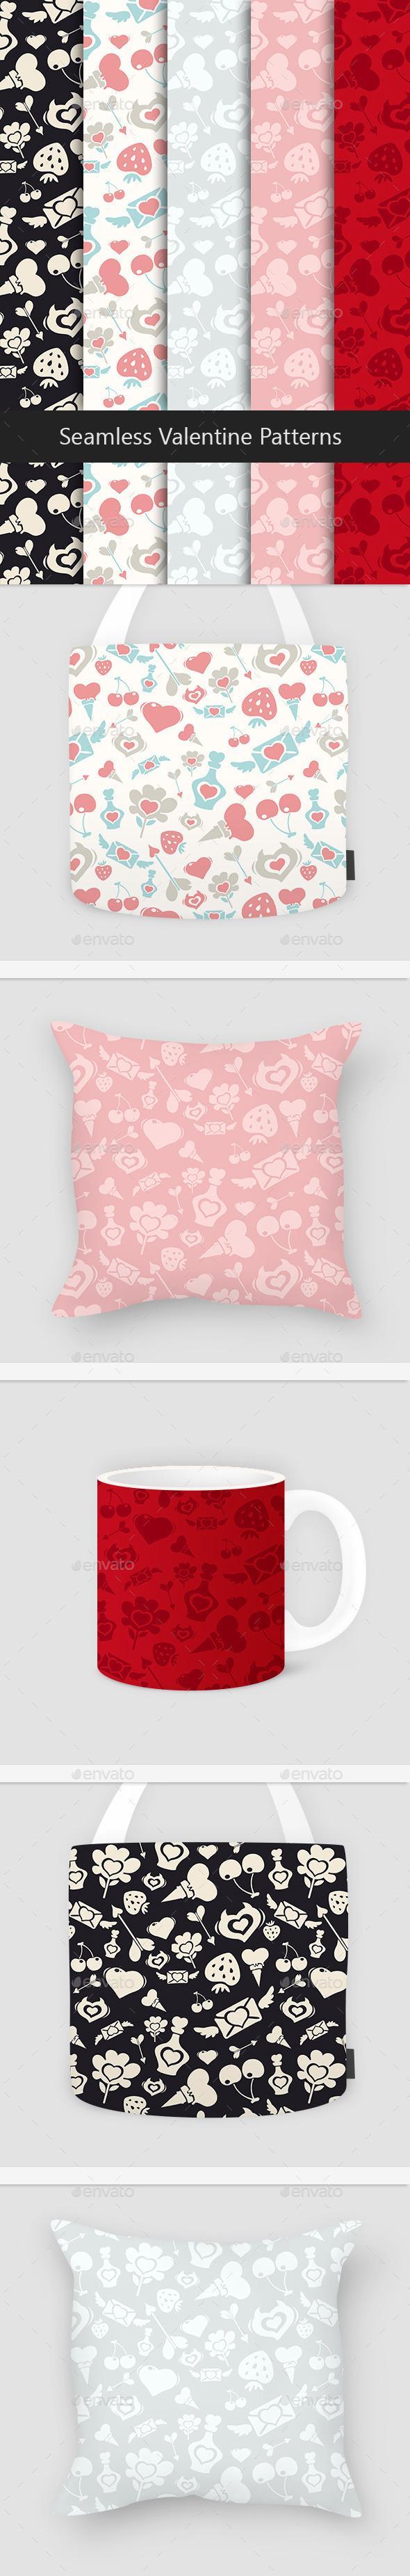 Seamless Valentine Patterns Set - Patterns Decorative